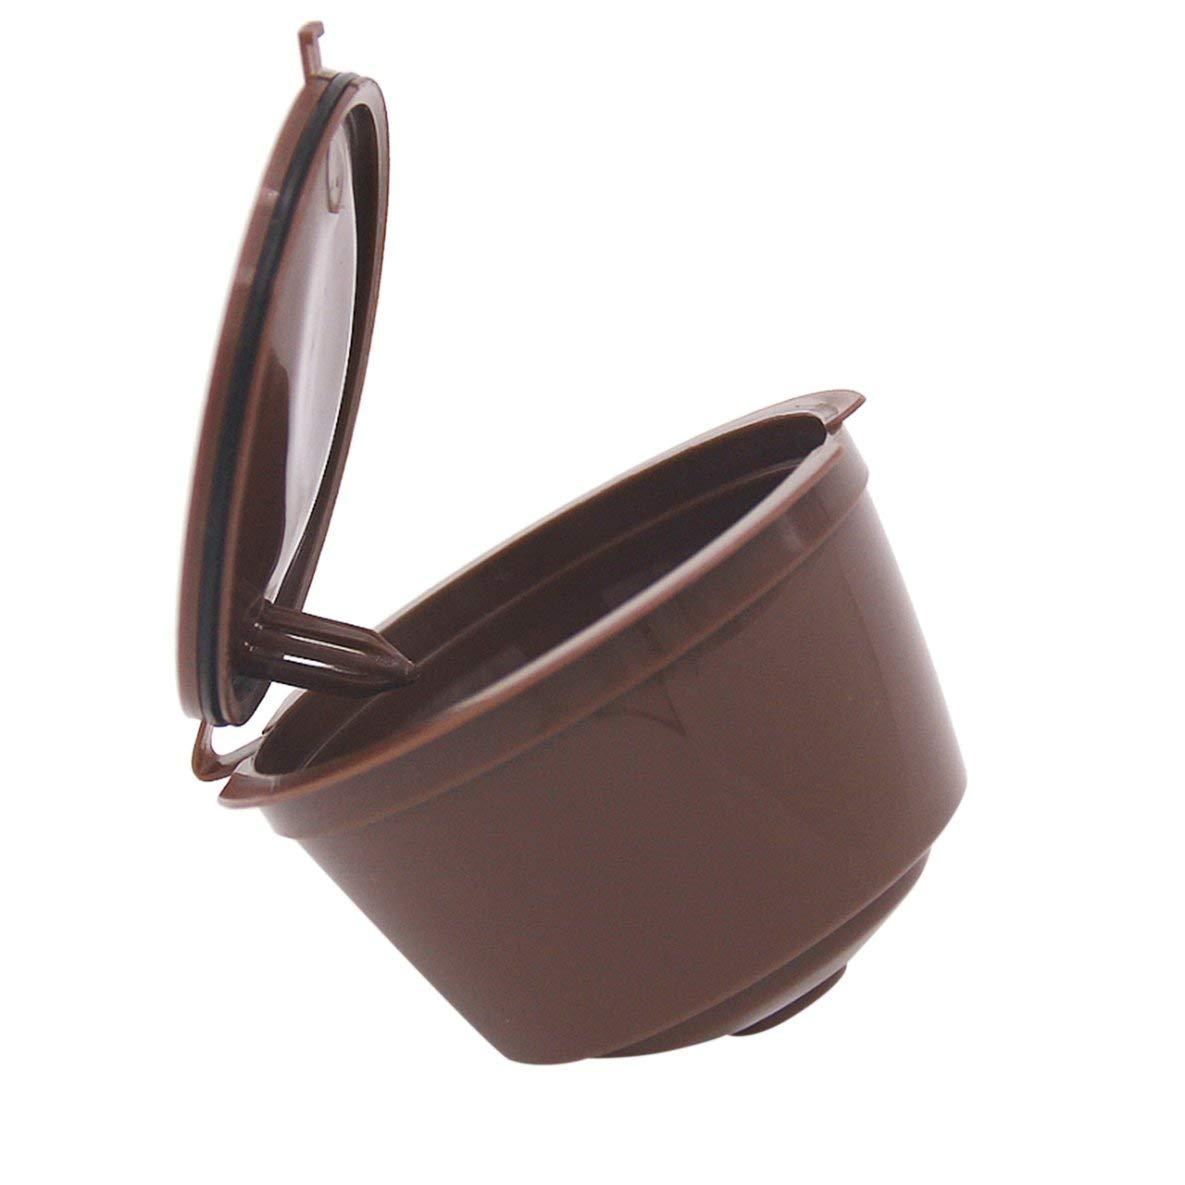 gfjfghfjfh Cestas de Filtro de caf/é de tama/ño peque/ño C/ápsulas de caf/é vac/ías Reutilizables Cestas Recargables de pl/ástico Taza de la Taza del Filtro del caf/é Express